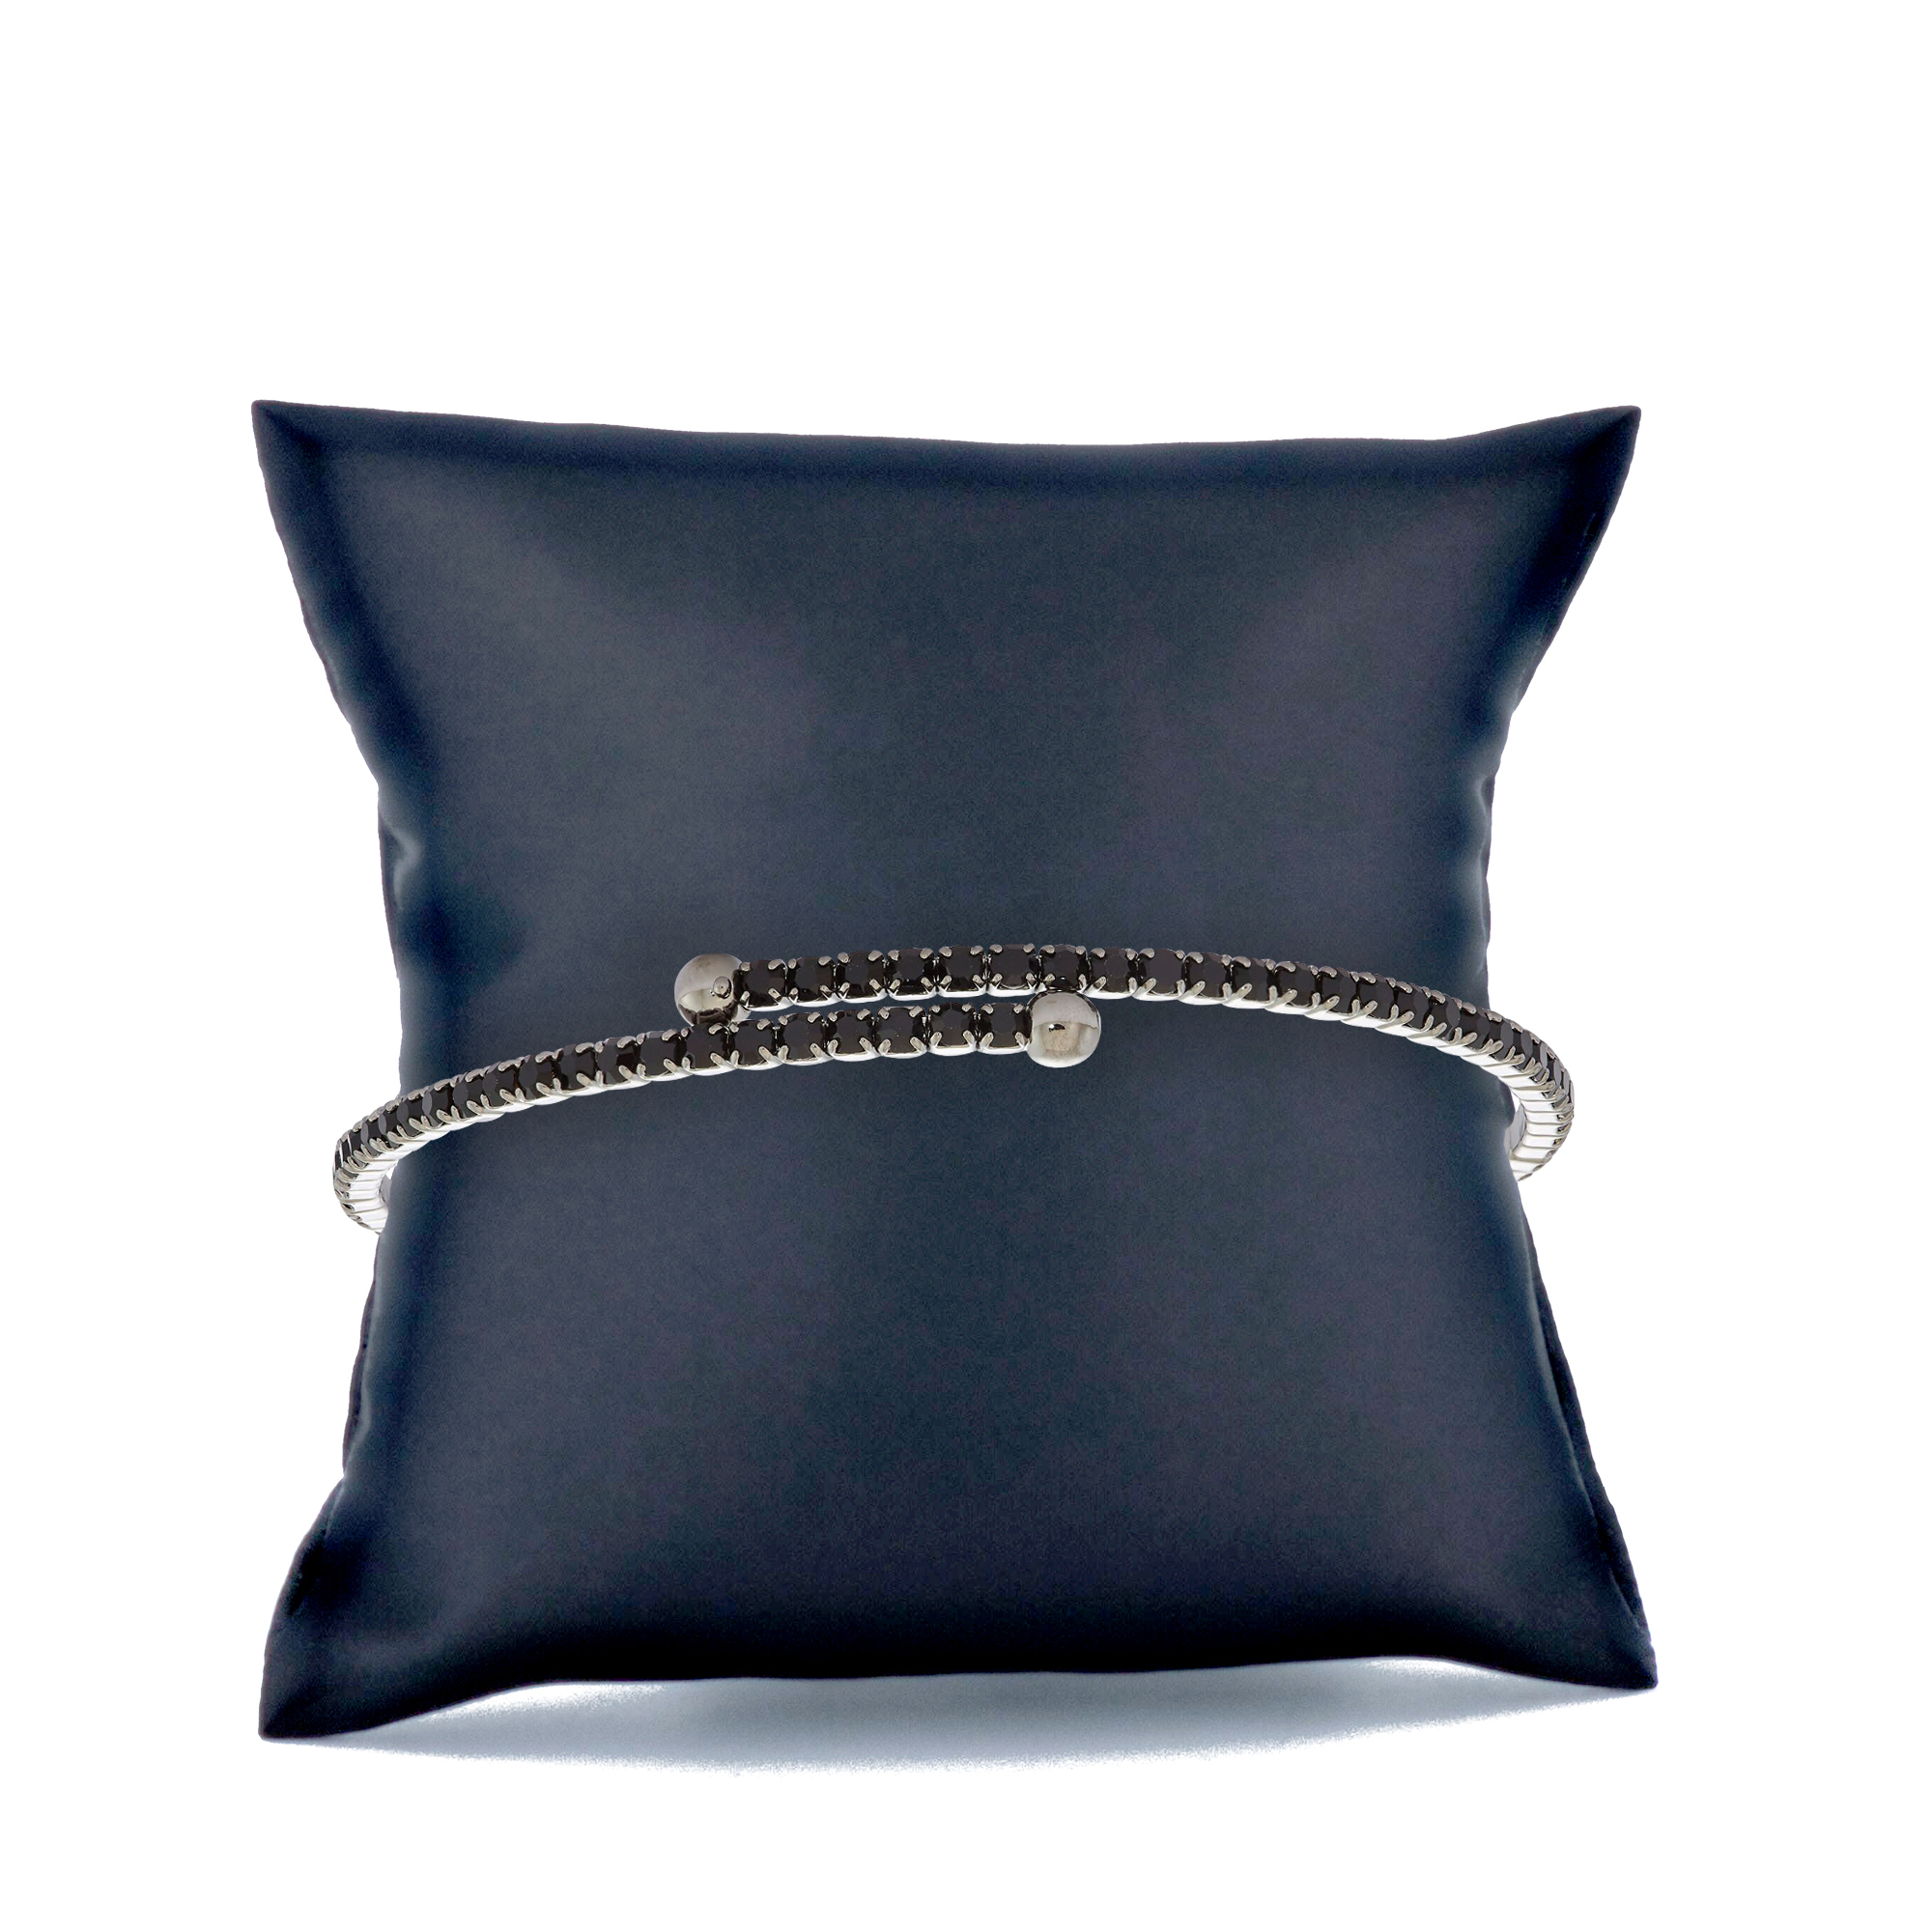 Womens-Ladies-Fashion-Accessories-Jewelry-Black-Rhodium-Plated-Bangle-Bracelet thumbnail 16